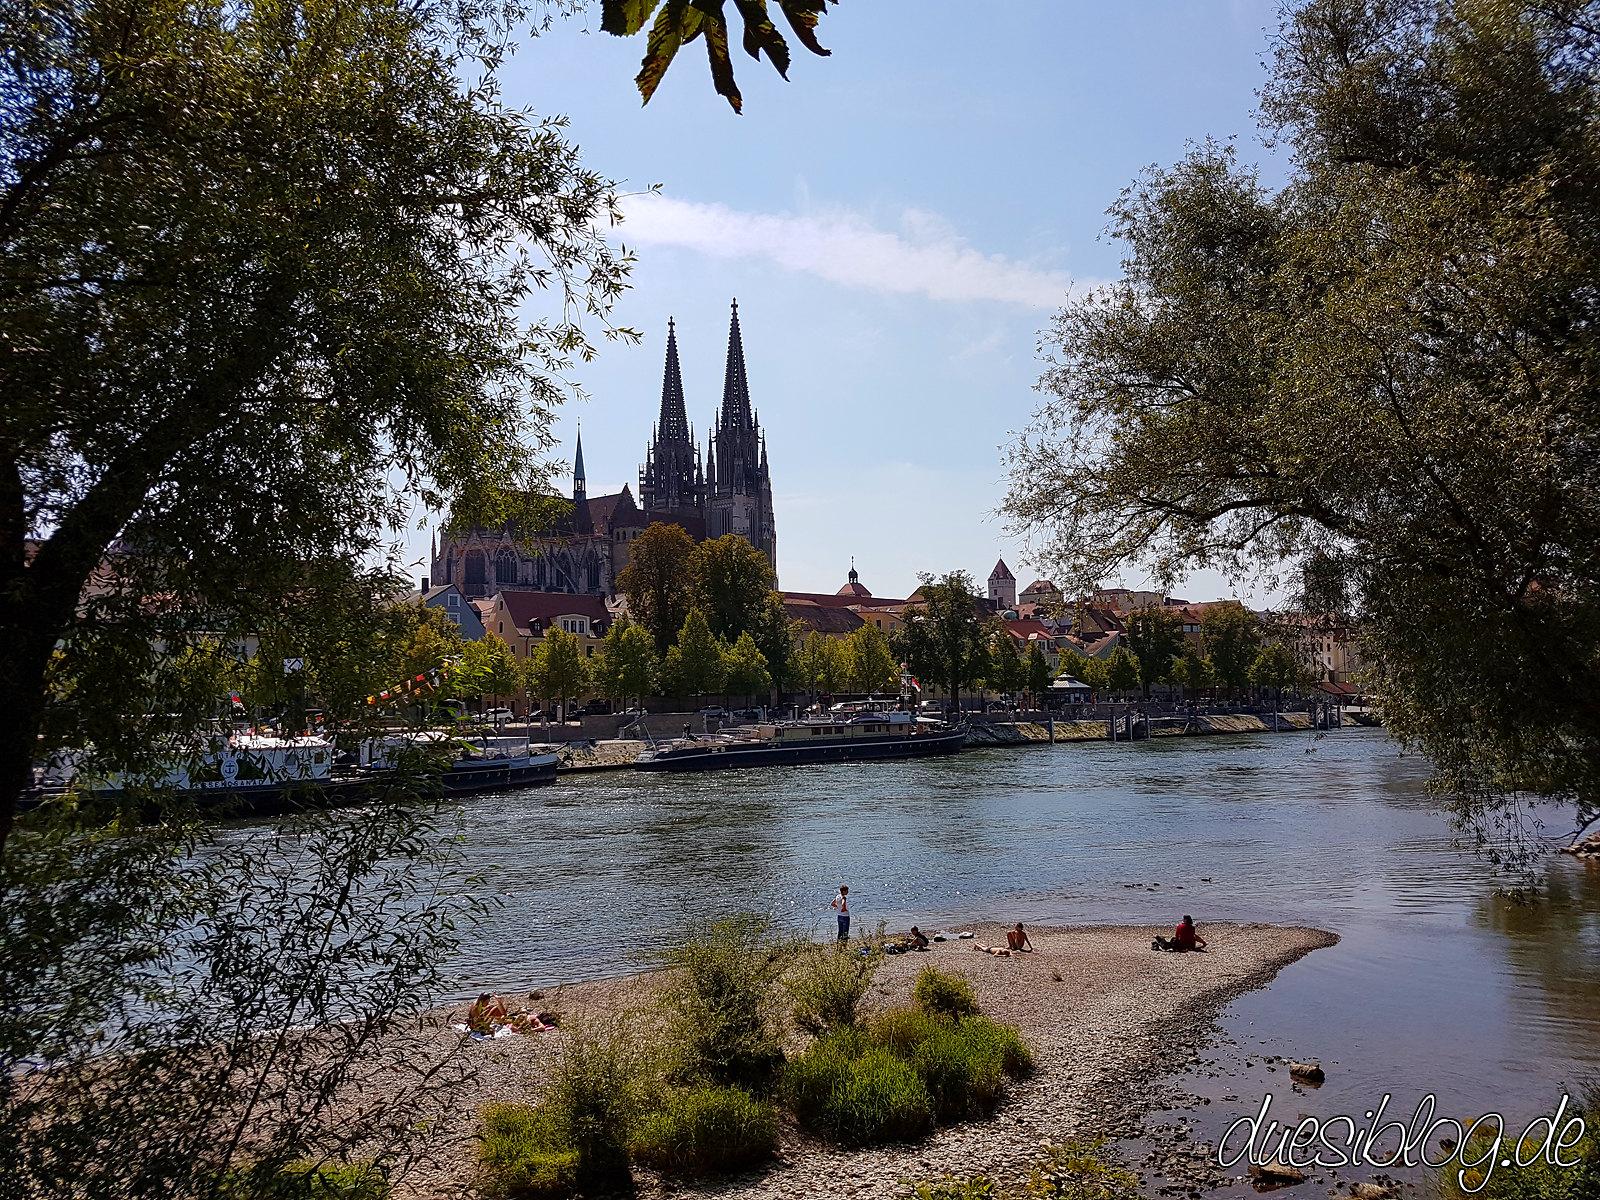 Regensburg Steinerne Brücke Donauufer Travelblog duesiblog 16